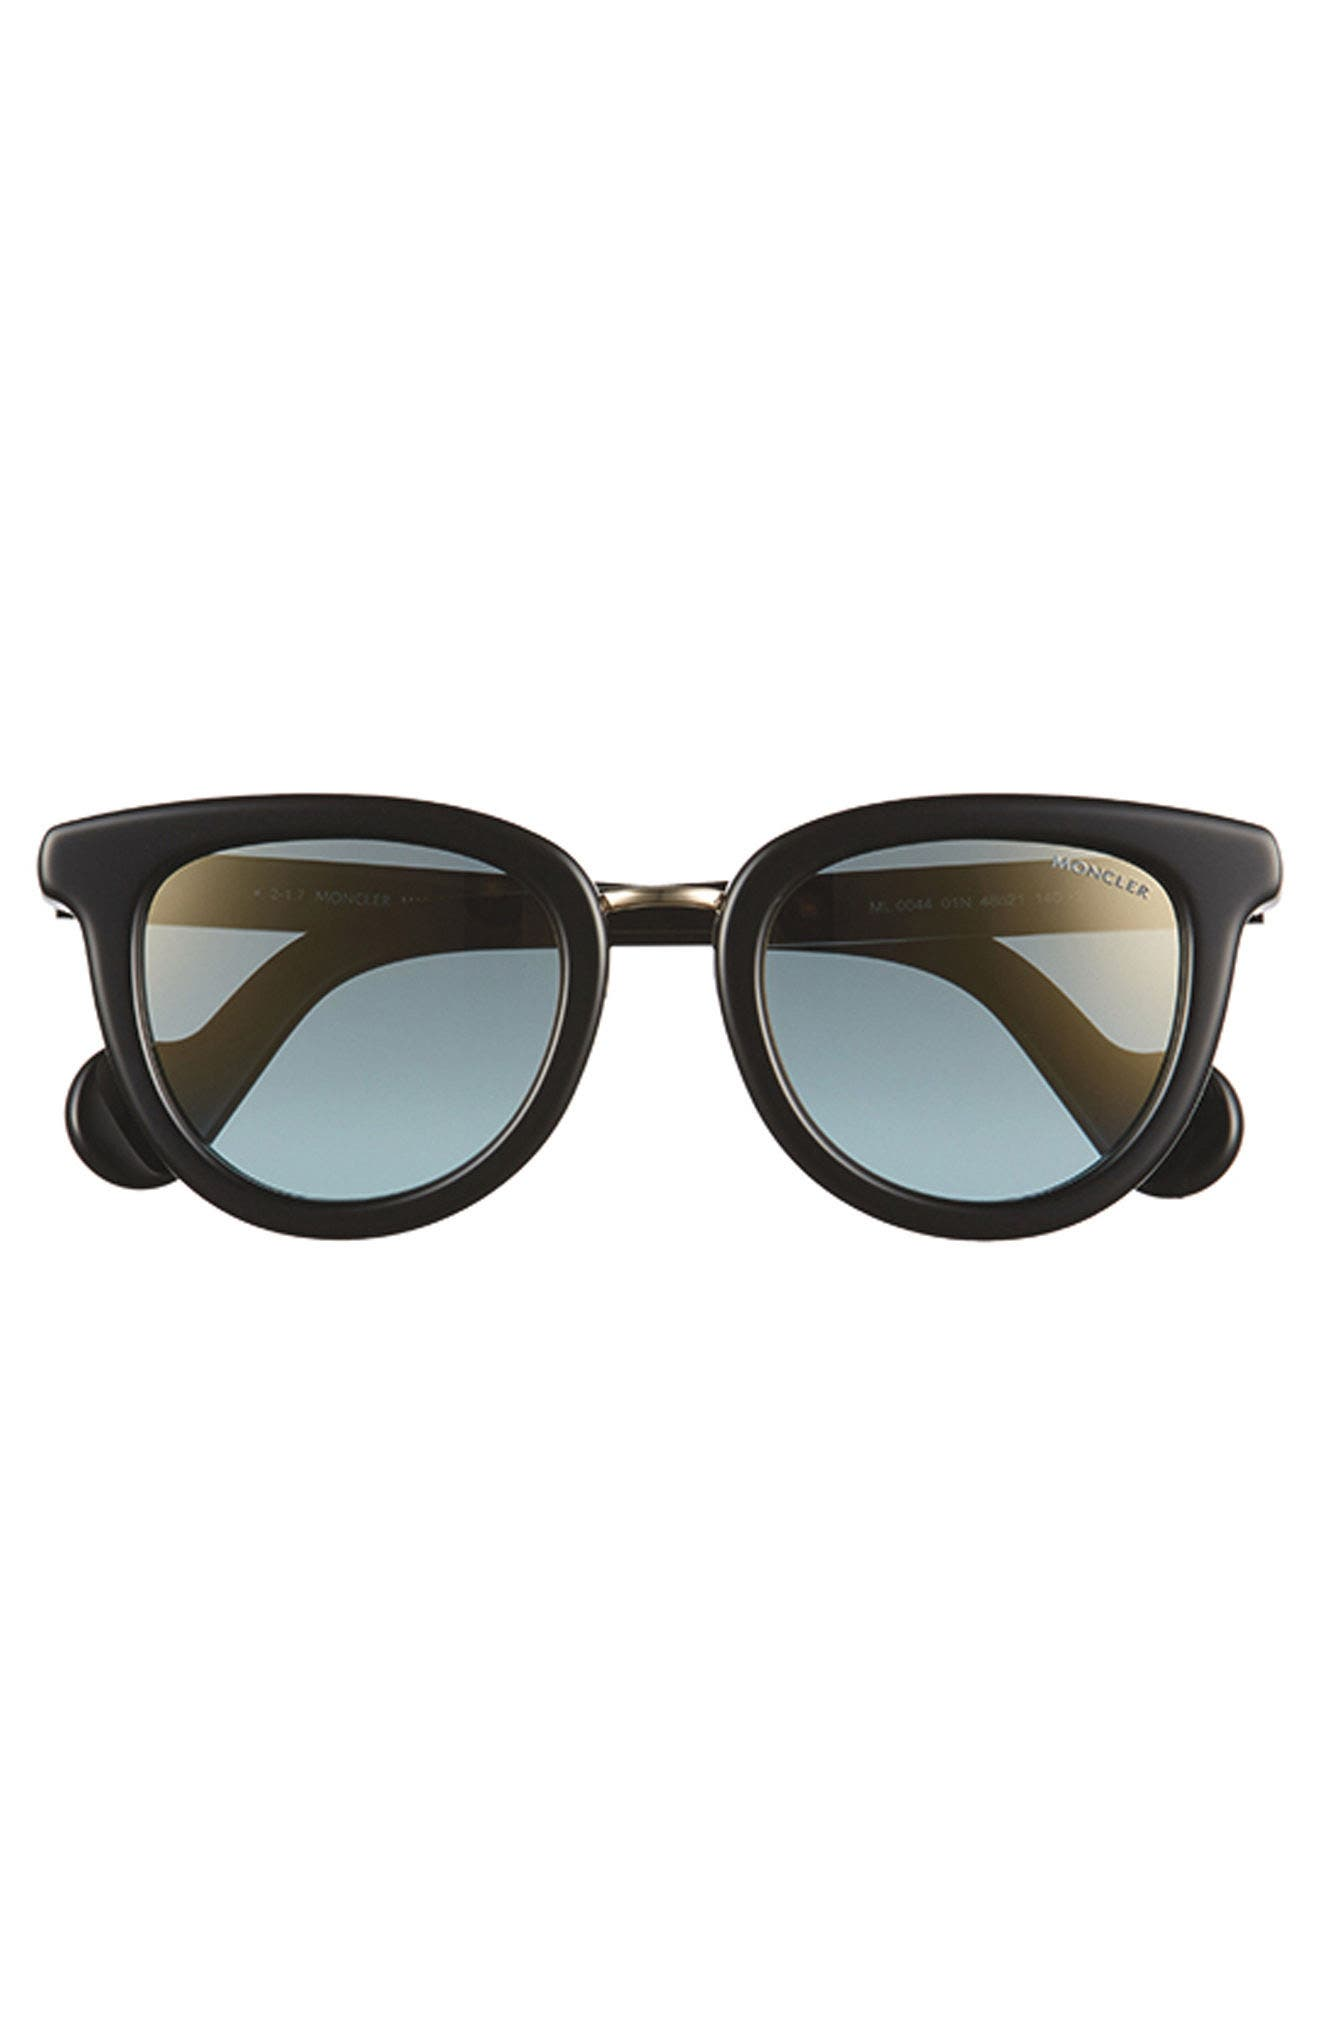 MONCLER, 48mm Cat Eye Sunglasses, Alternate thumbnail 4, color, PEARL BROWN/ GREY/ SAND